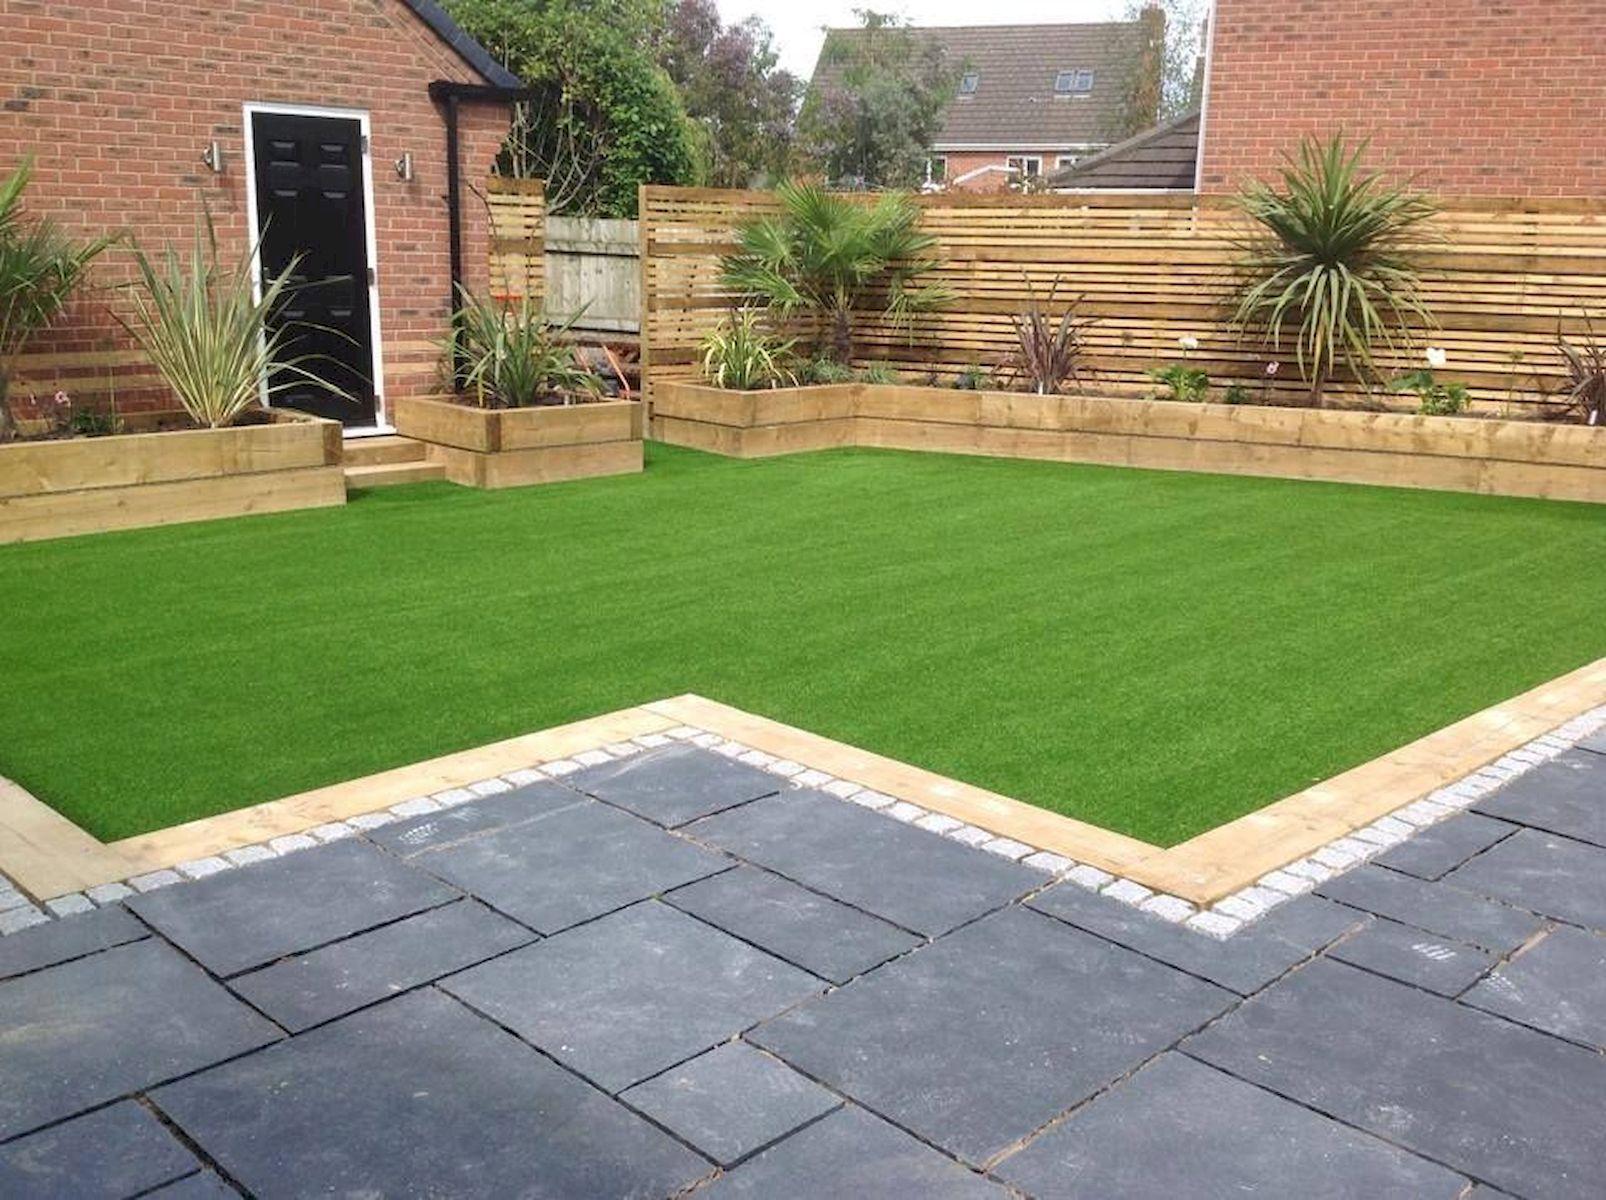 Cool Latest Trends In Decorating Outdoor Living Spaces 20 Modern Yard Landscaping Ideashttps Hajarfresh Com L Back Garden Design Garden Paving Garden Design